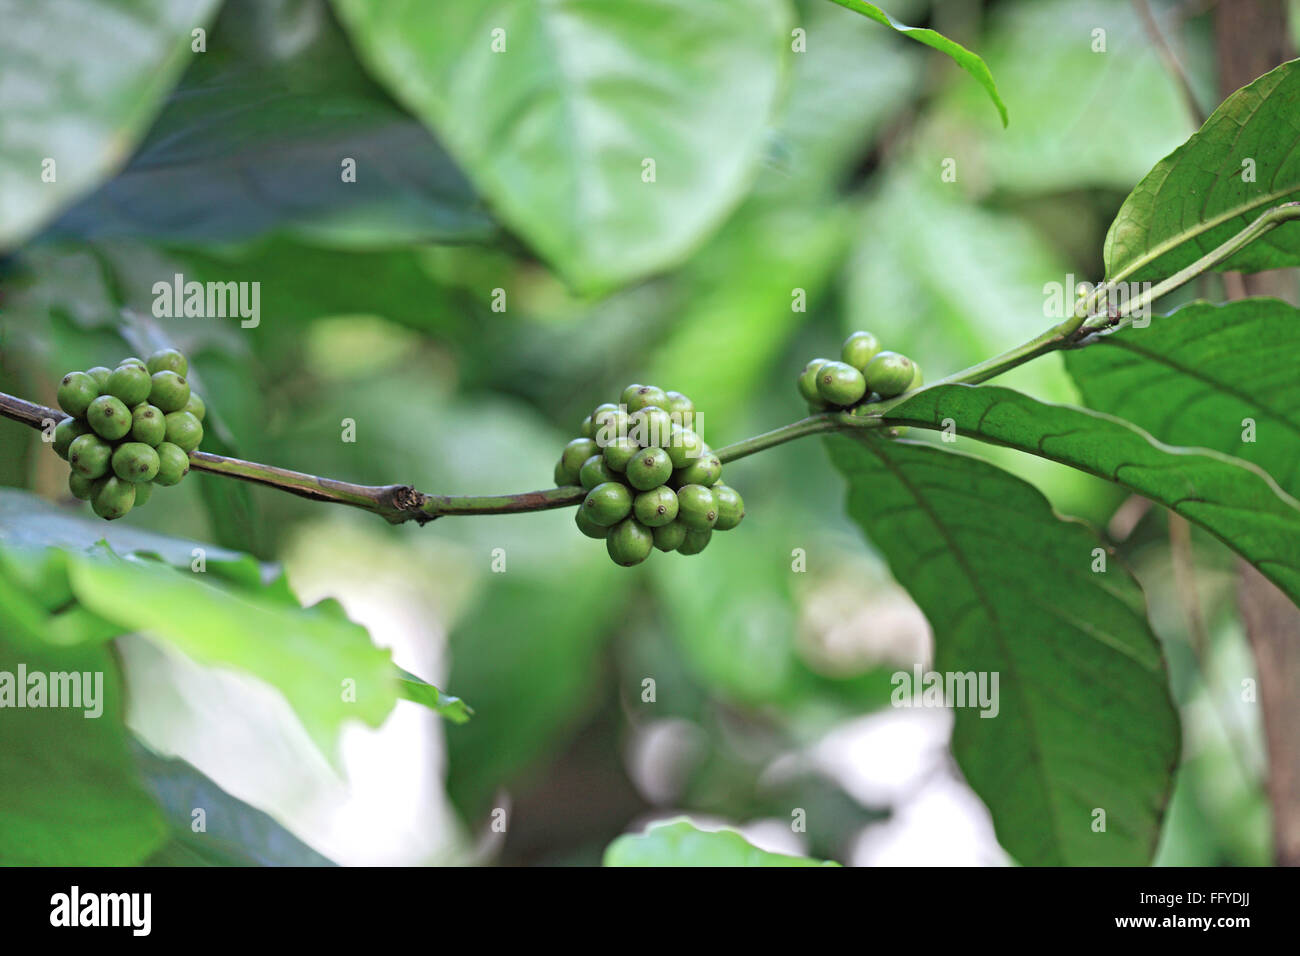 Coffee plant arabica ; Thekkady Thekkadi ; Dist Idukki ; Kerala ; India - Stock Image